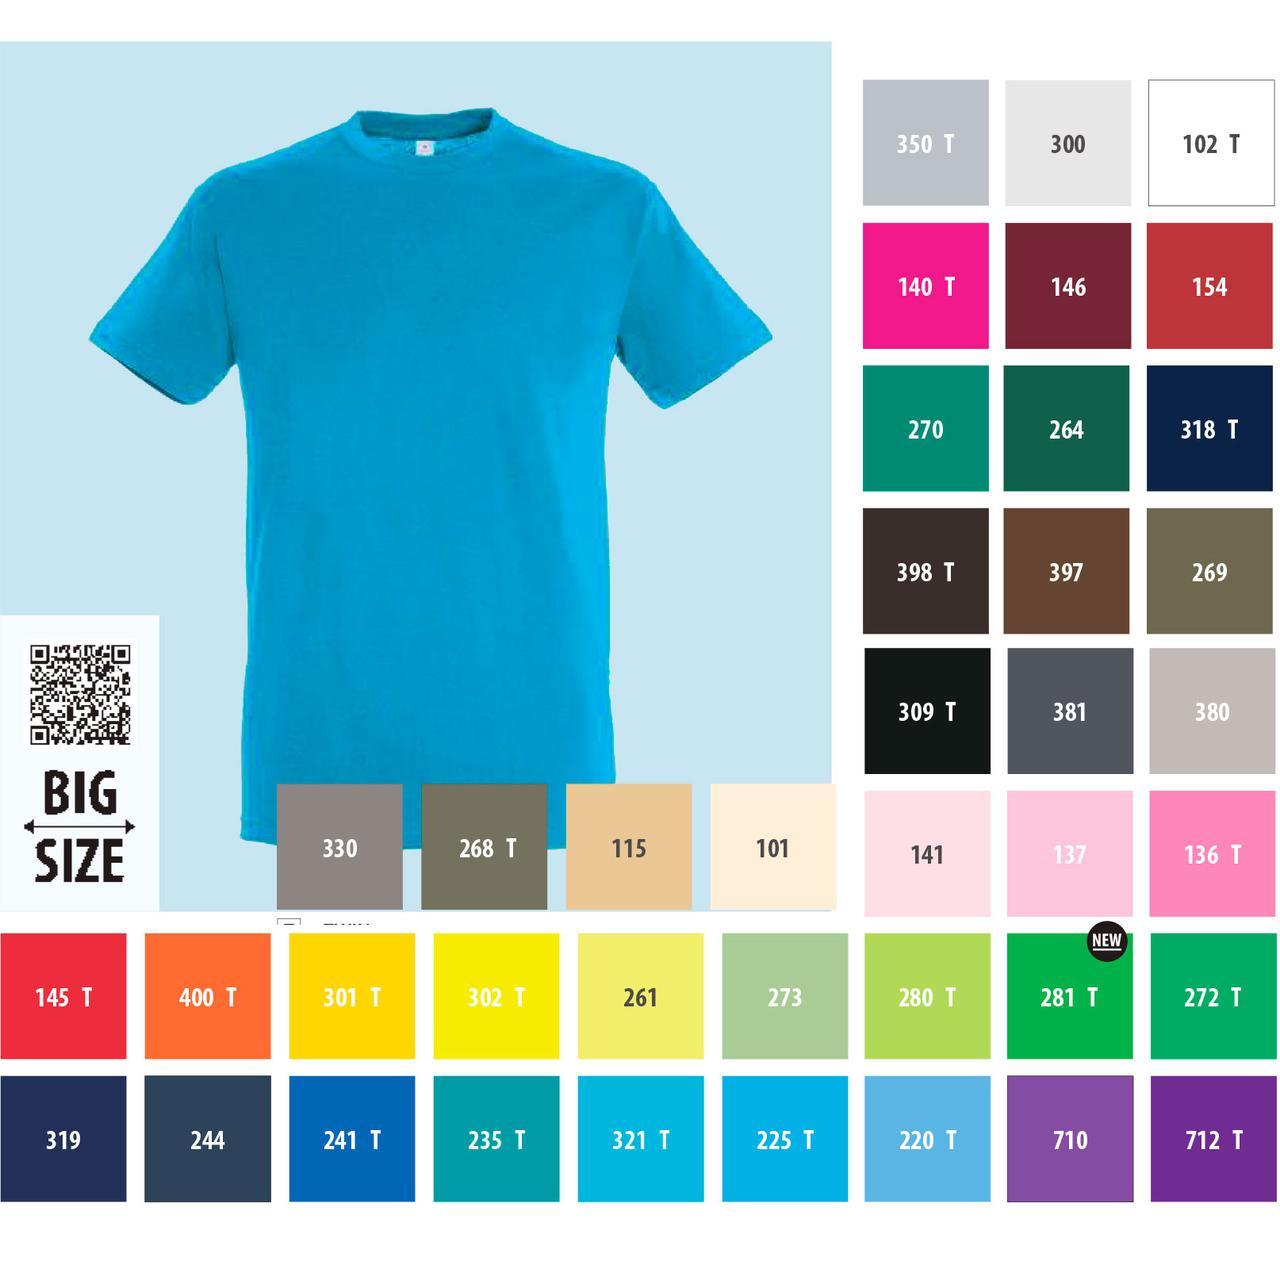 21742e99b033e Футболки SOL'S REGENT або GILDAN SoftStyle, 41 цвет, размеры от XS до 3XL  под